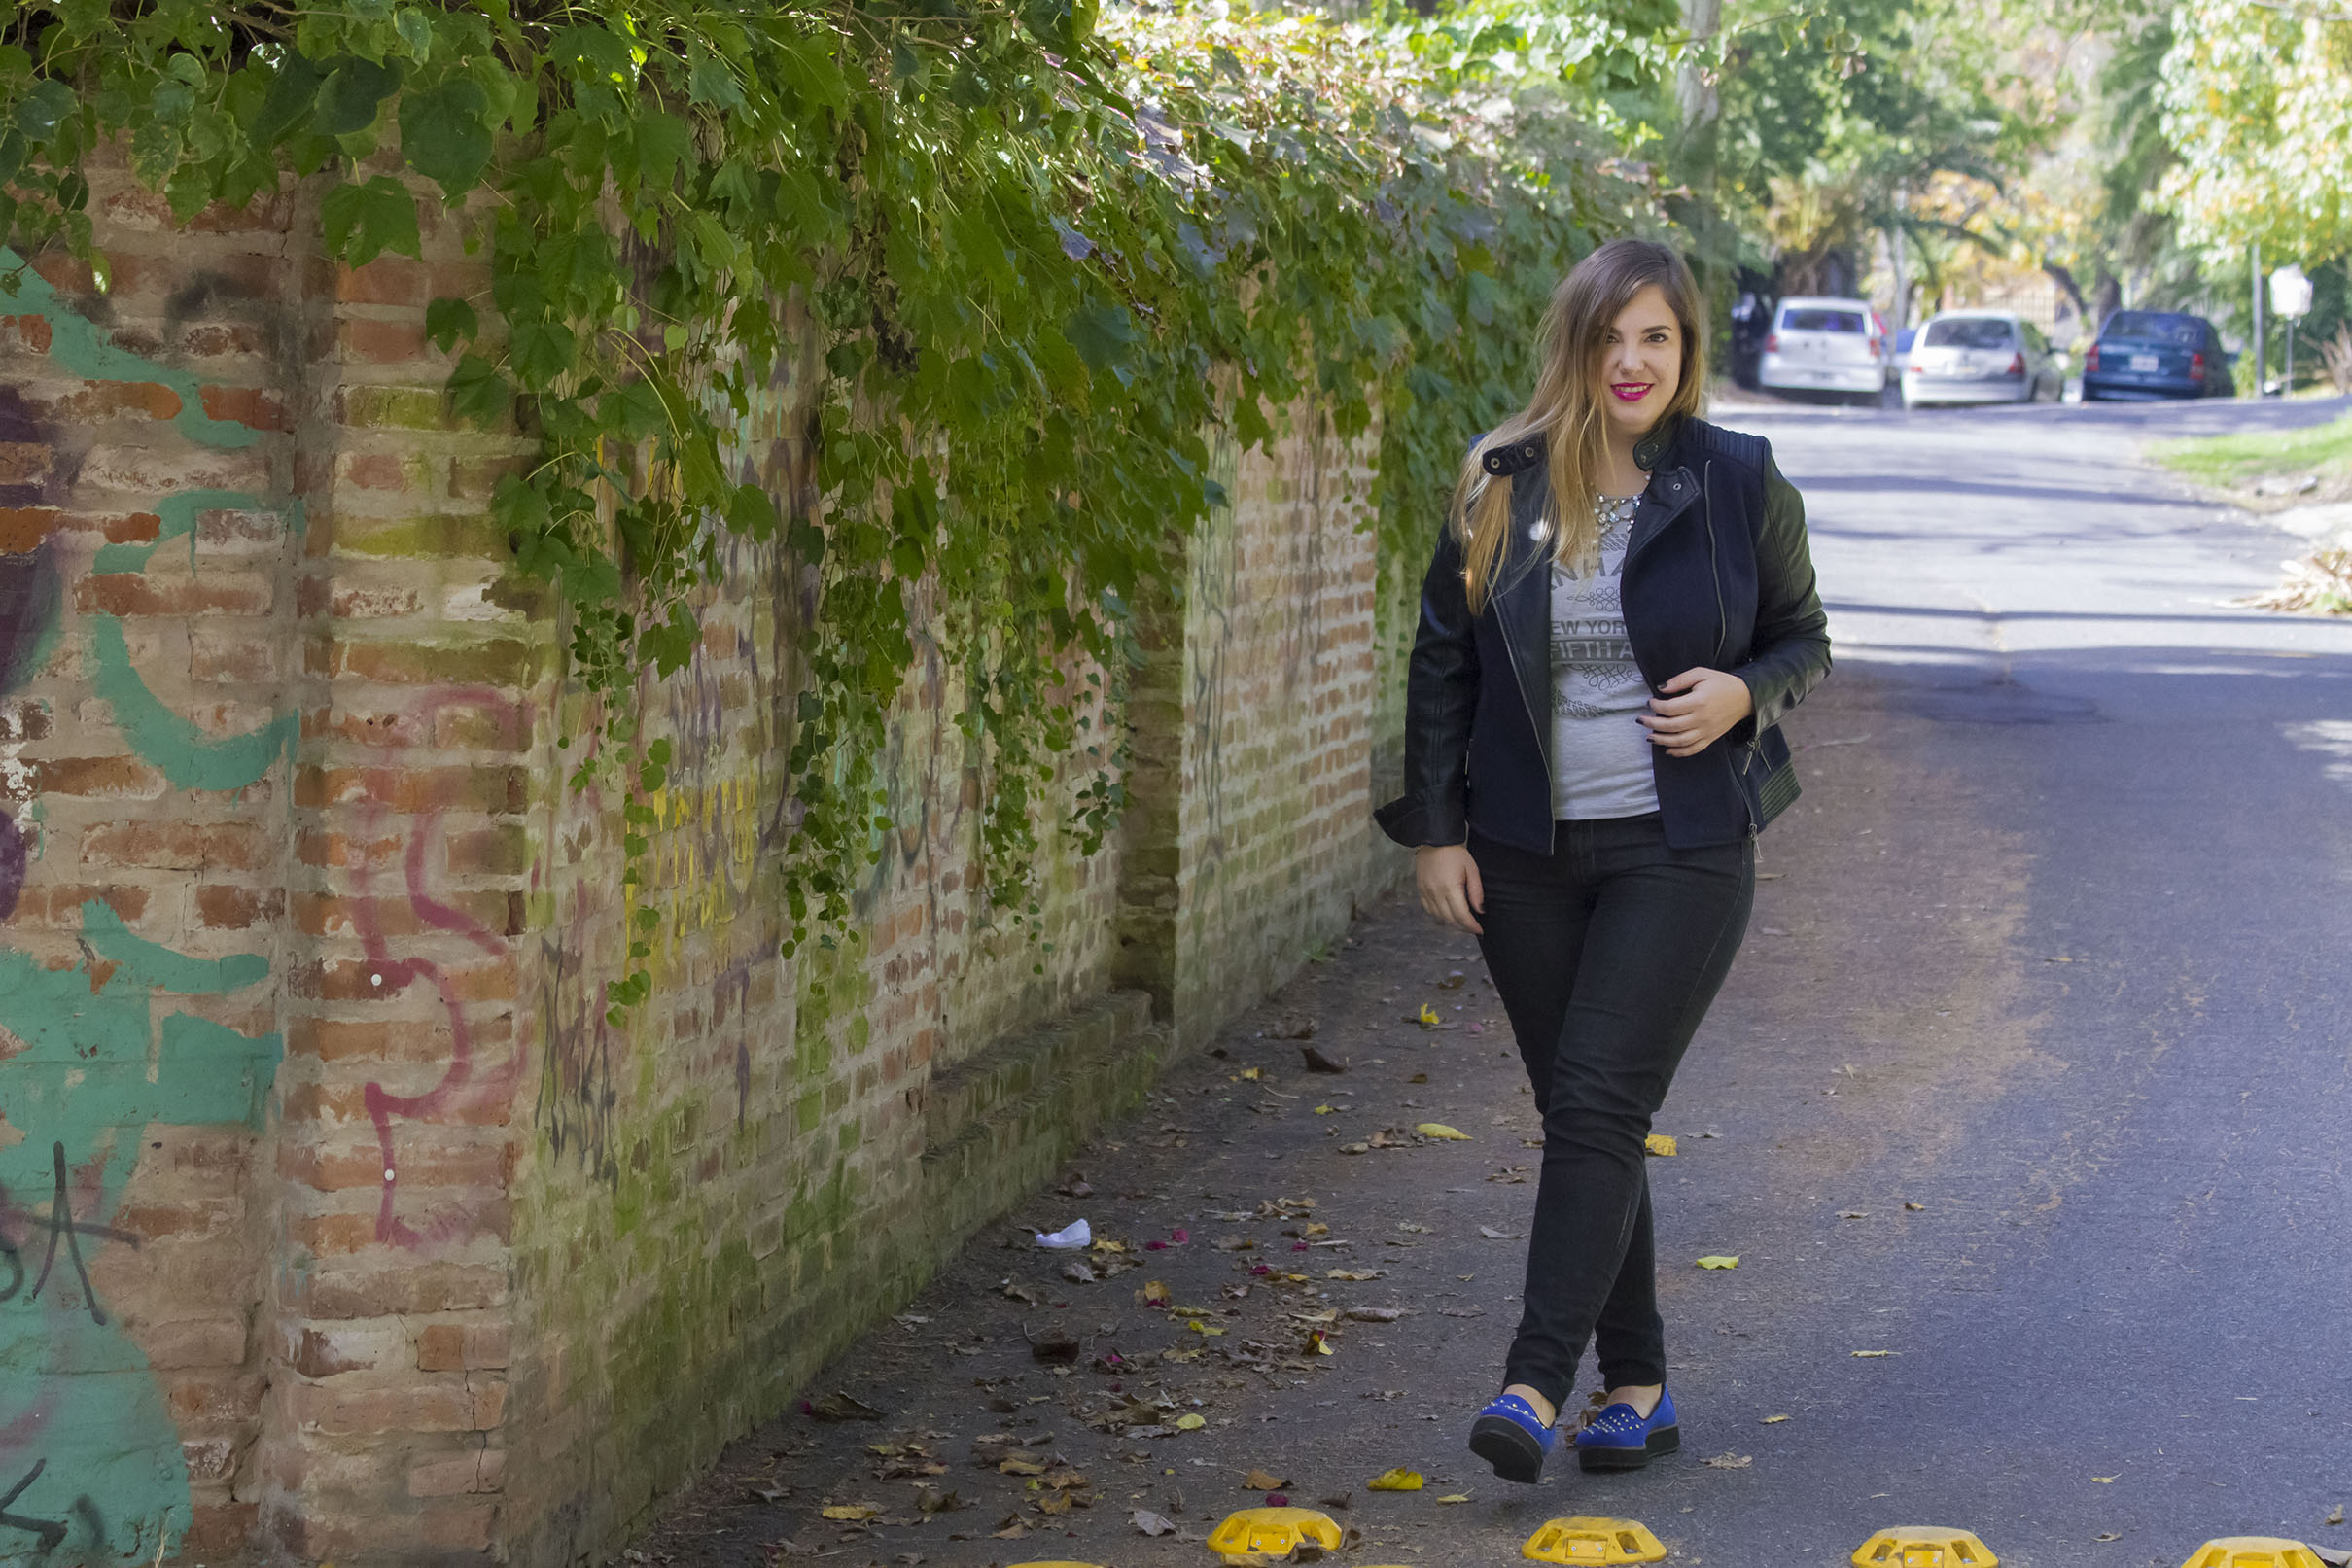 Get the look: Jeans, Jazmín Chebar. Remera, Portsaid. Zapatos con tachas, Lucerna. Campera, Koxis. Collar Zara.